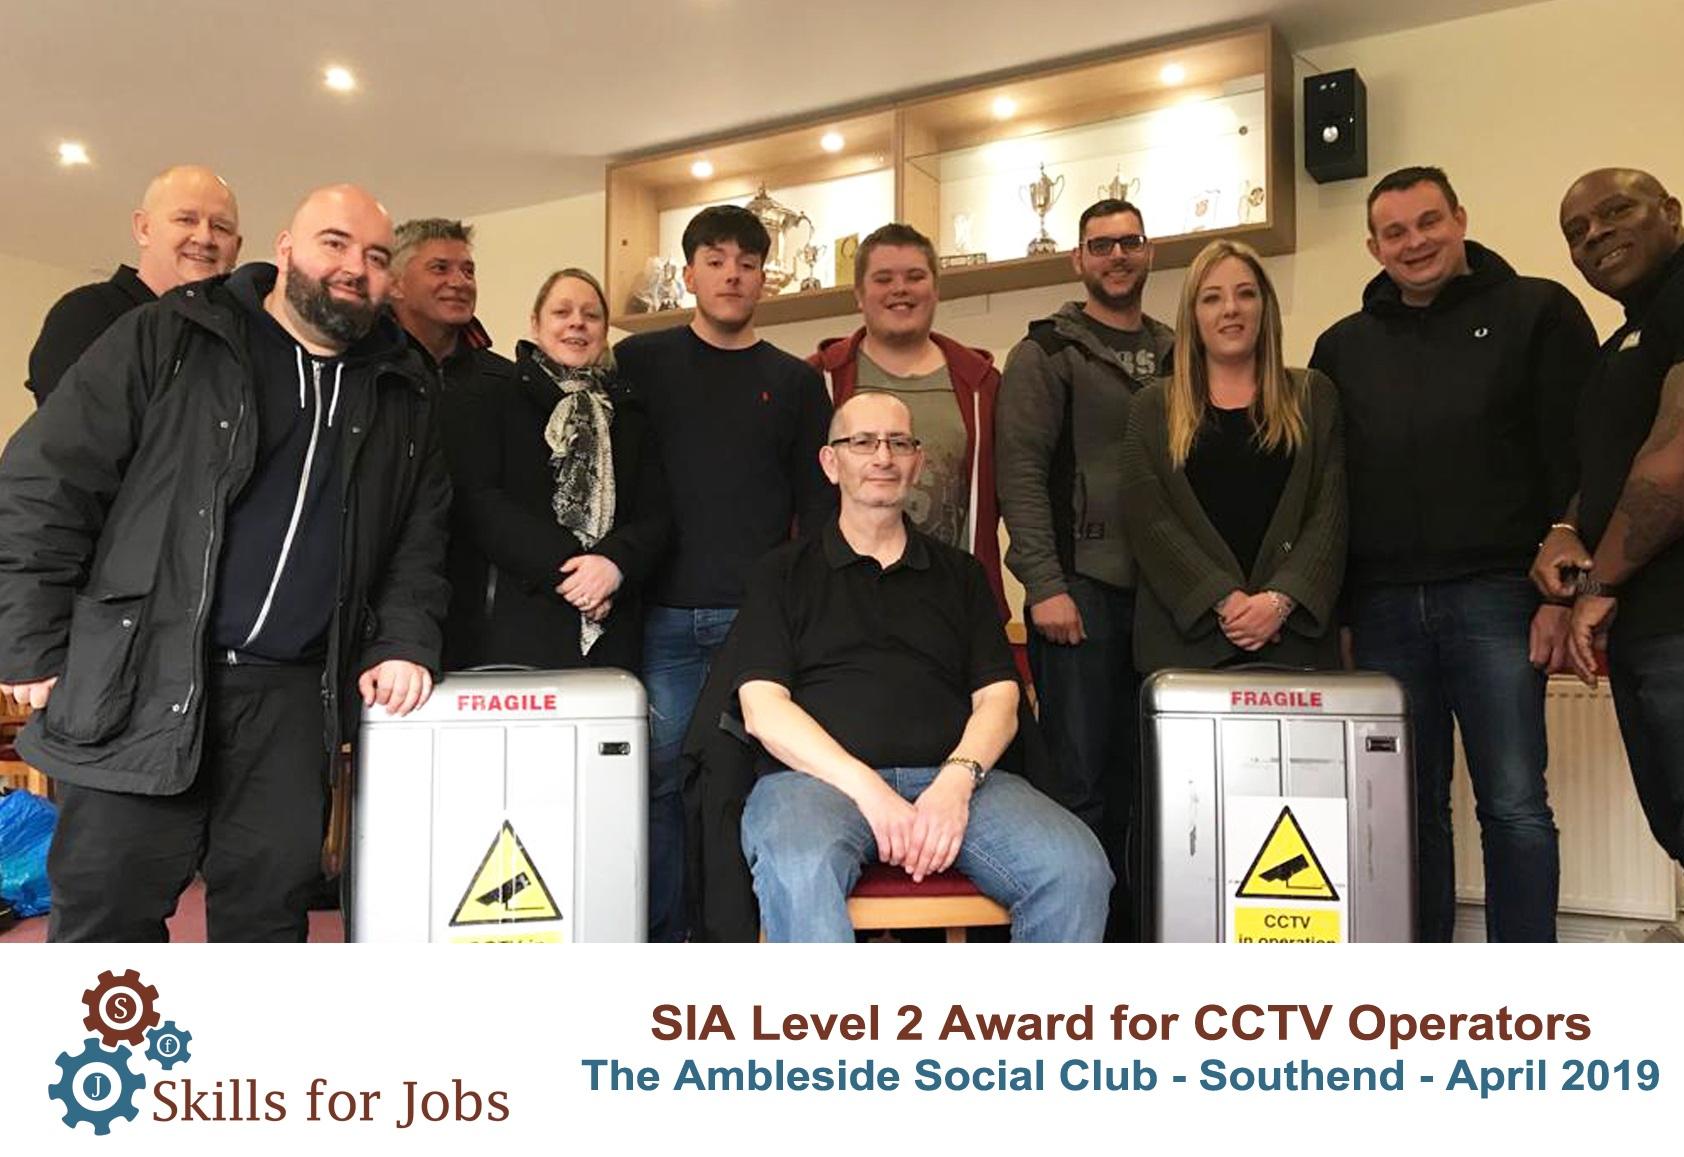 Sthend-CCTV-Apr-2019-TT-MH